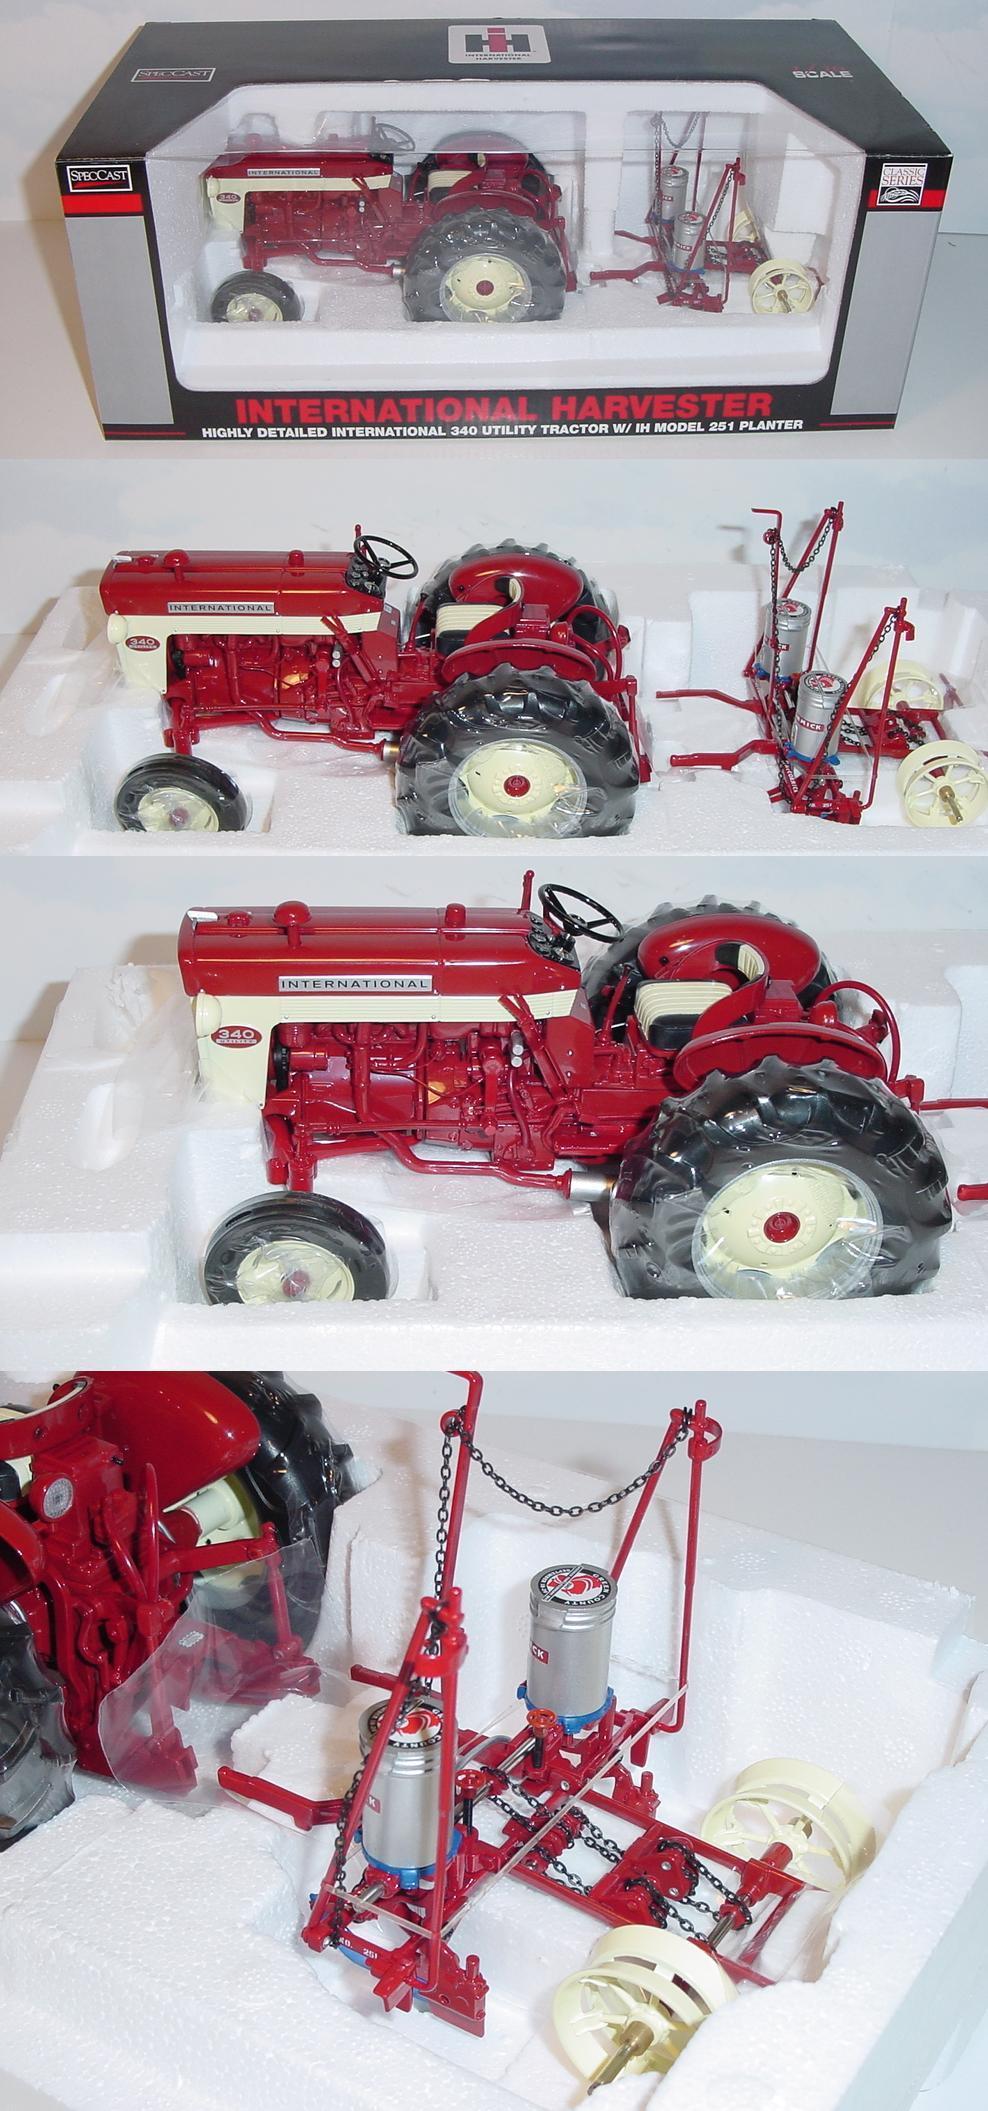 Ih 656 Wiring Diagram Jd 3020 Auto International Tractor Diagrams Farmall 806 Sel Parts